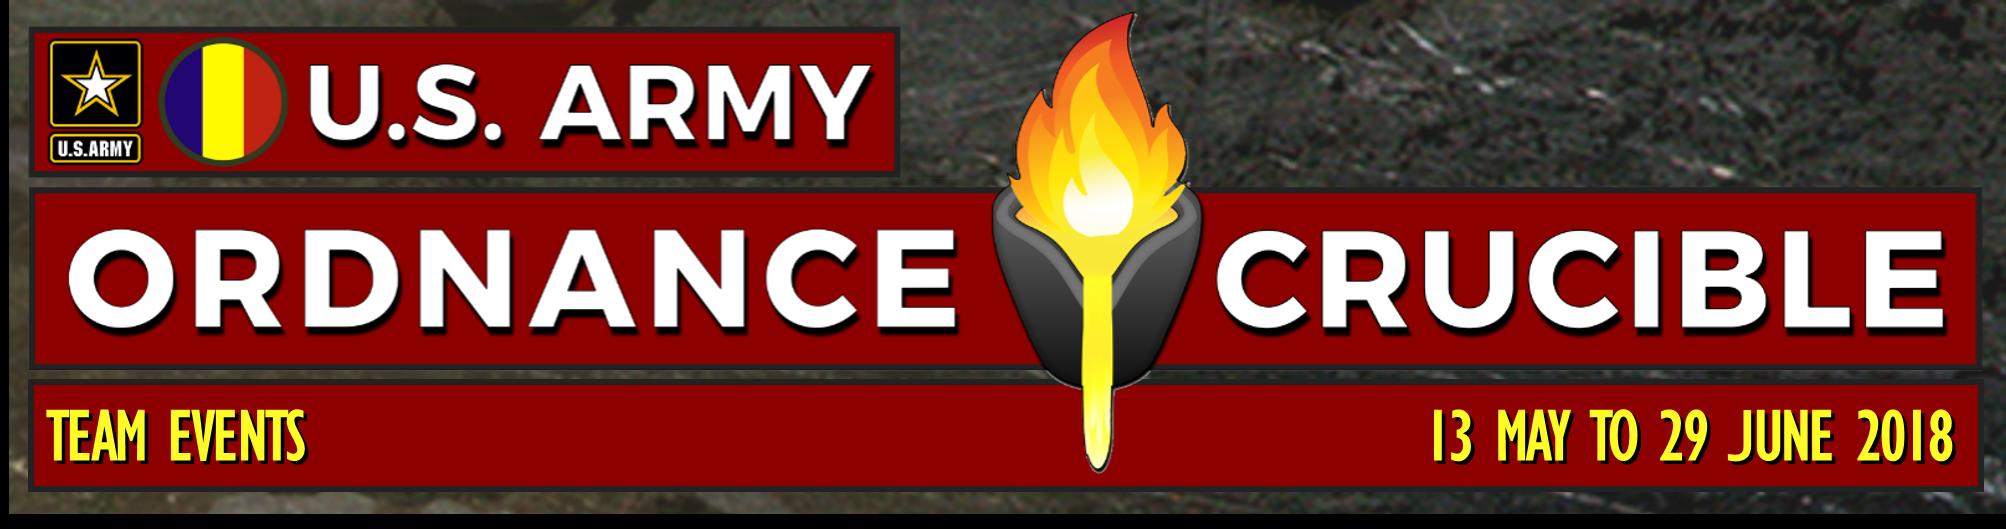 Ordnance Crucible banner